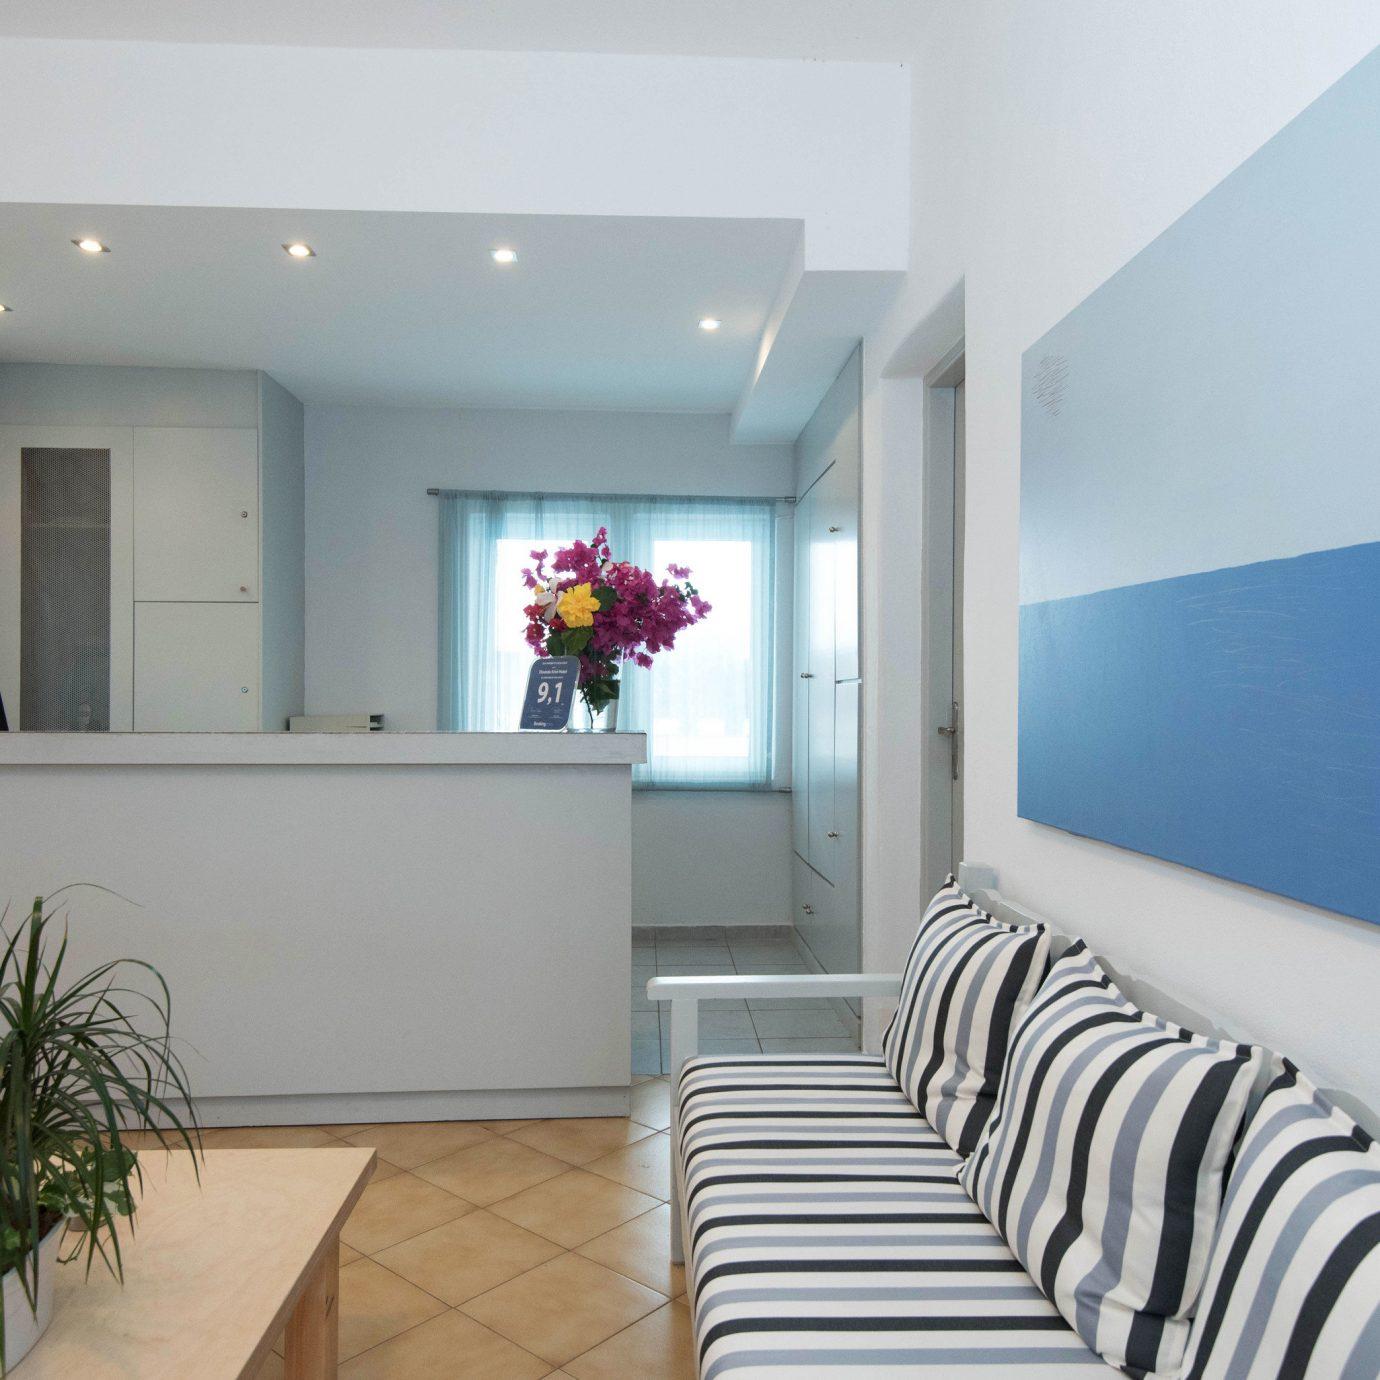 property condominium living room home daylighting plant waiting room Modern